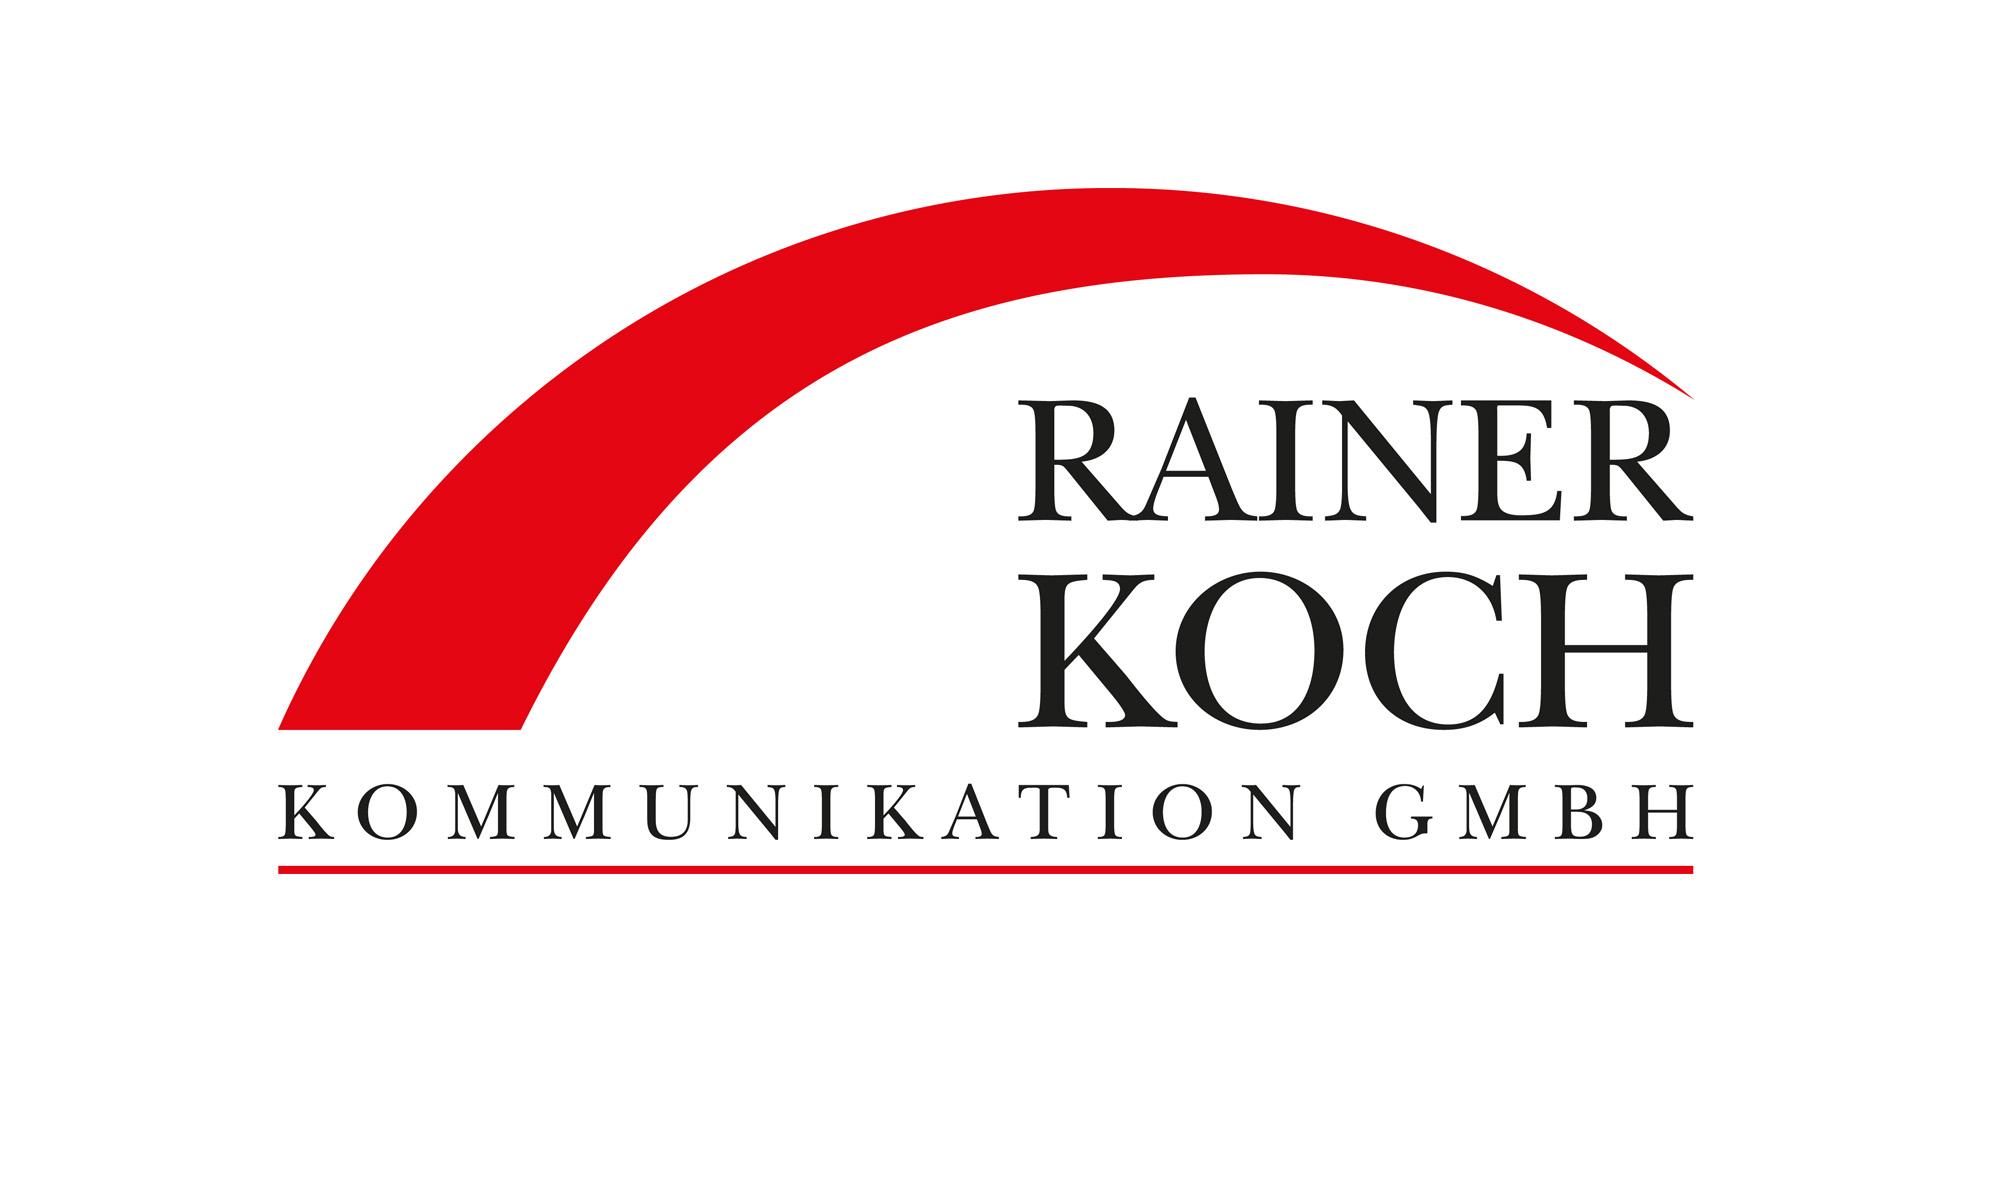 Rainer Koch Kommunikation GmbH